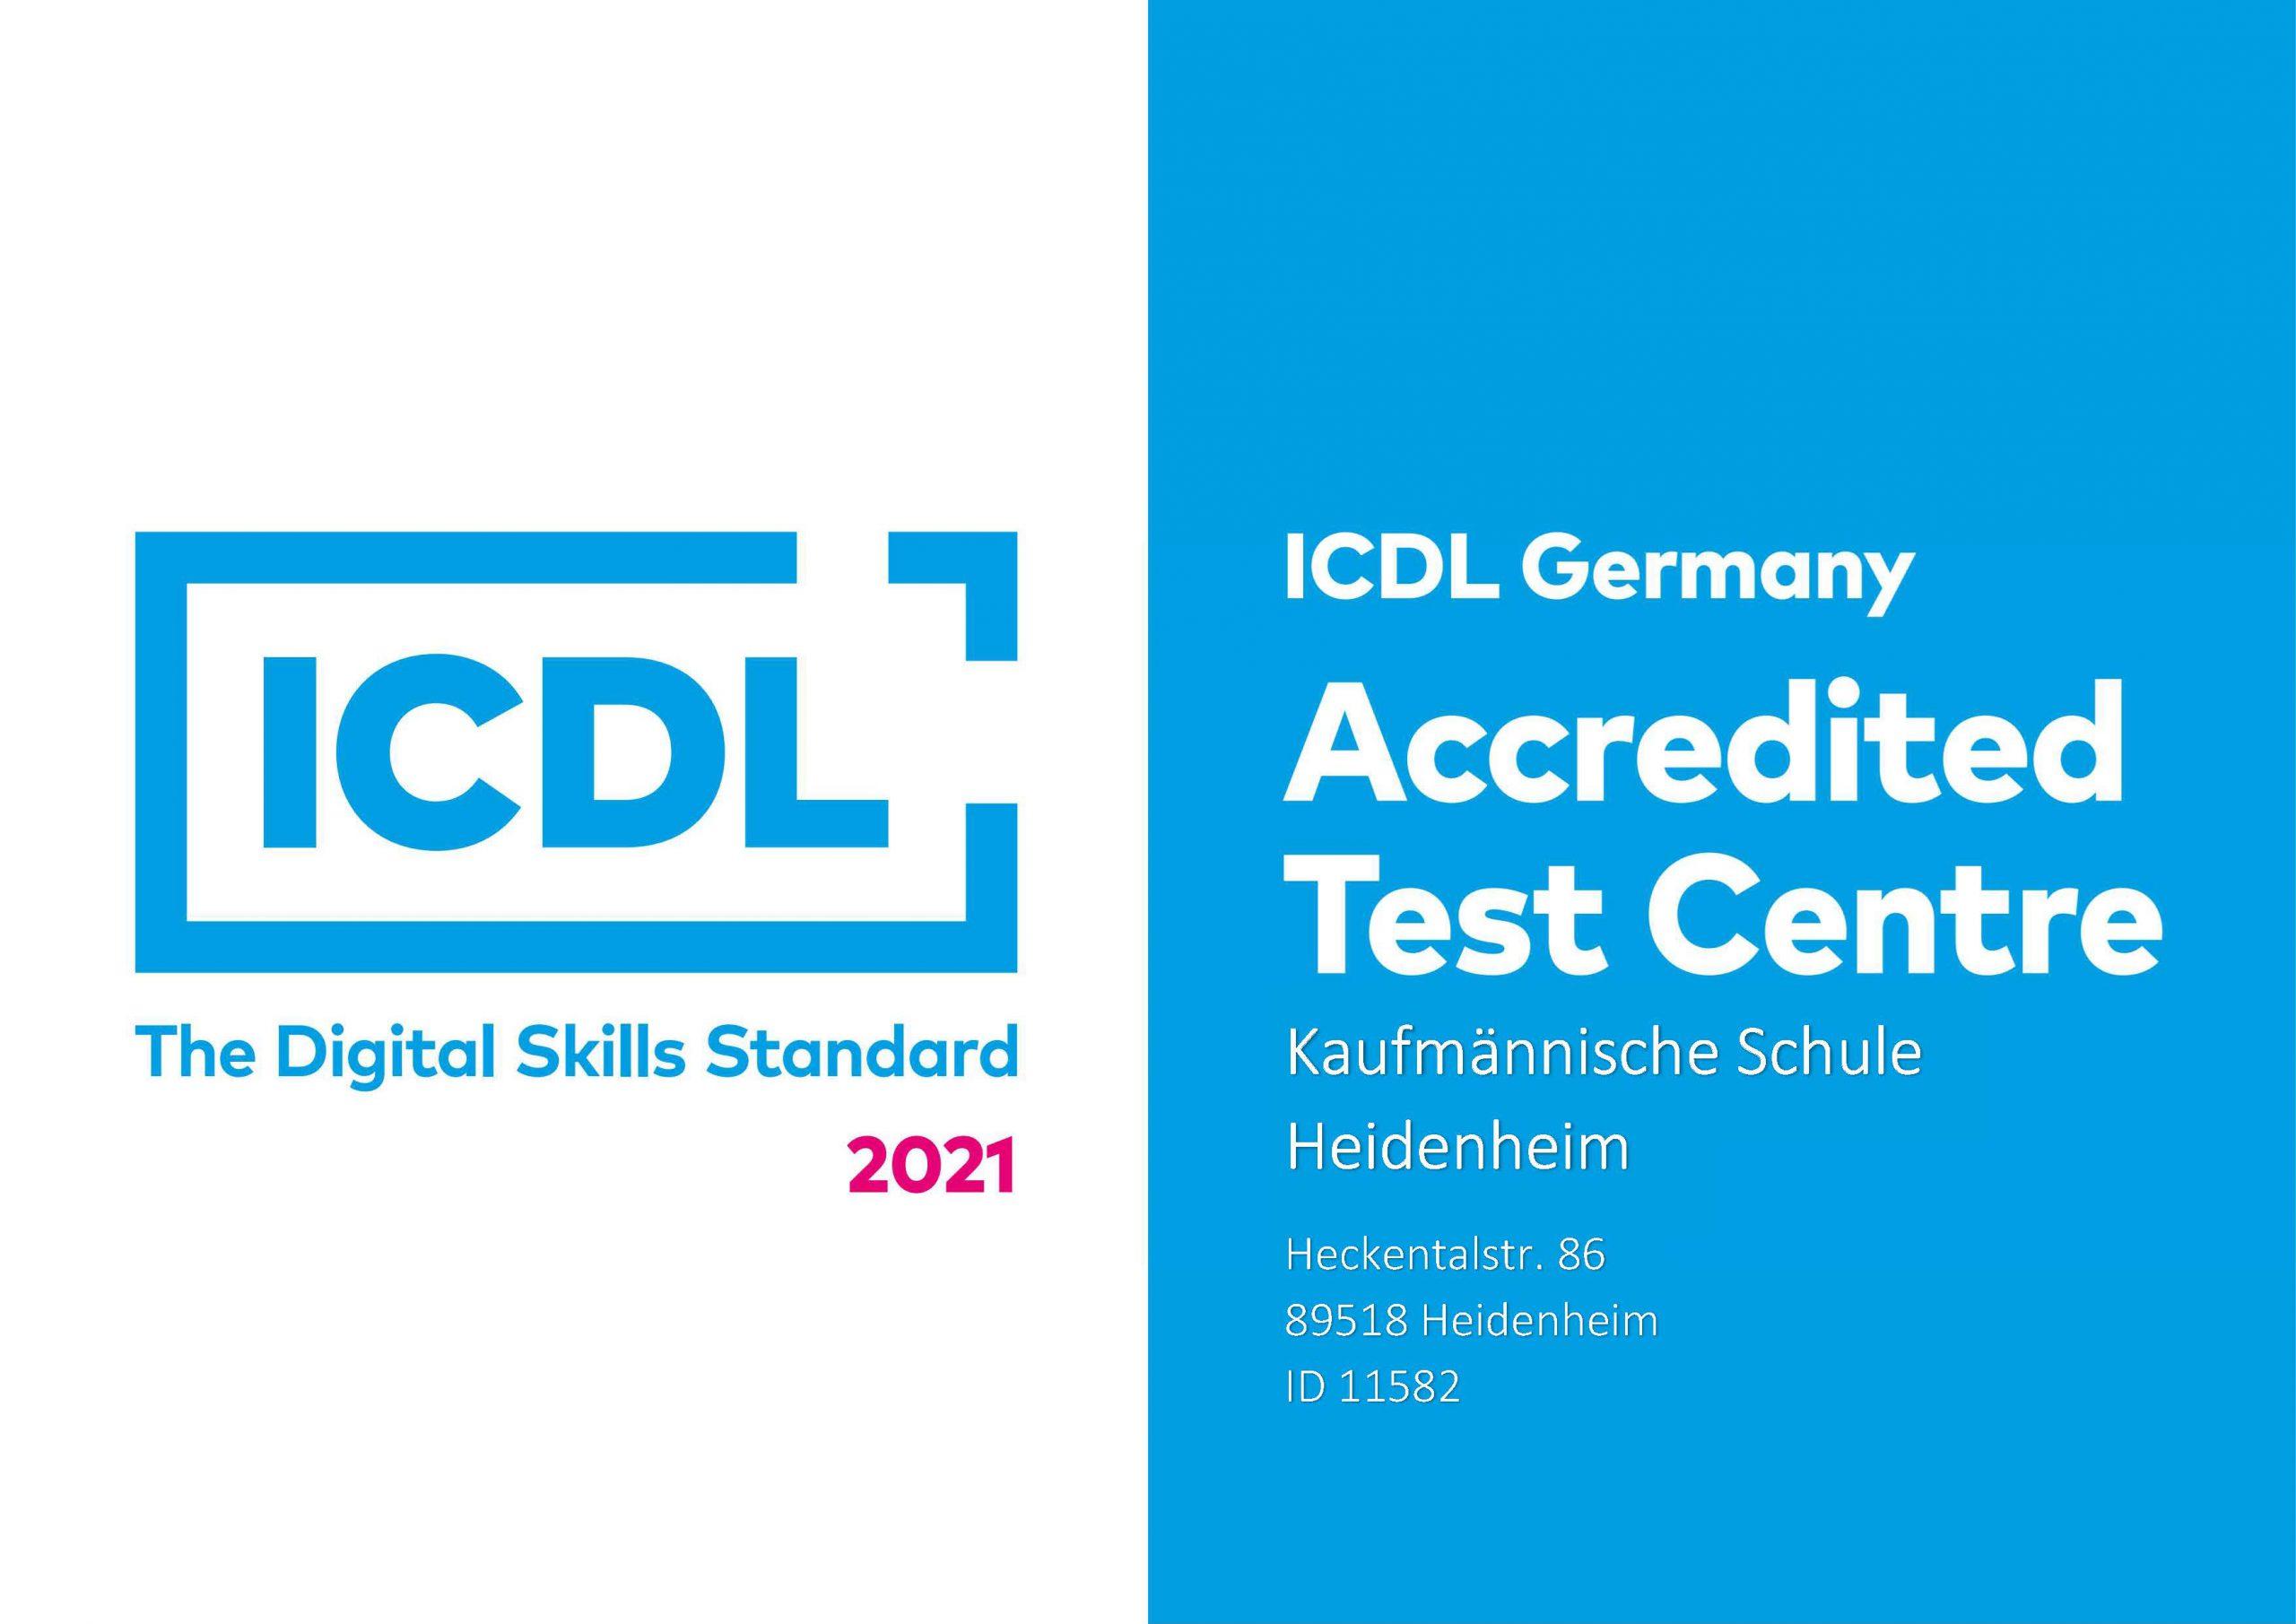 ICDL Testcentre KSH